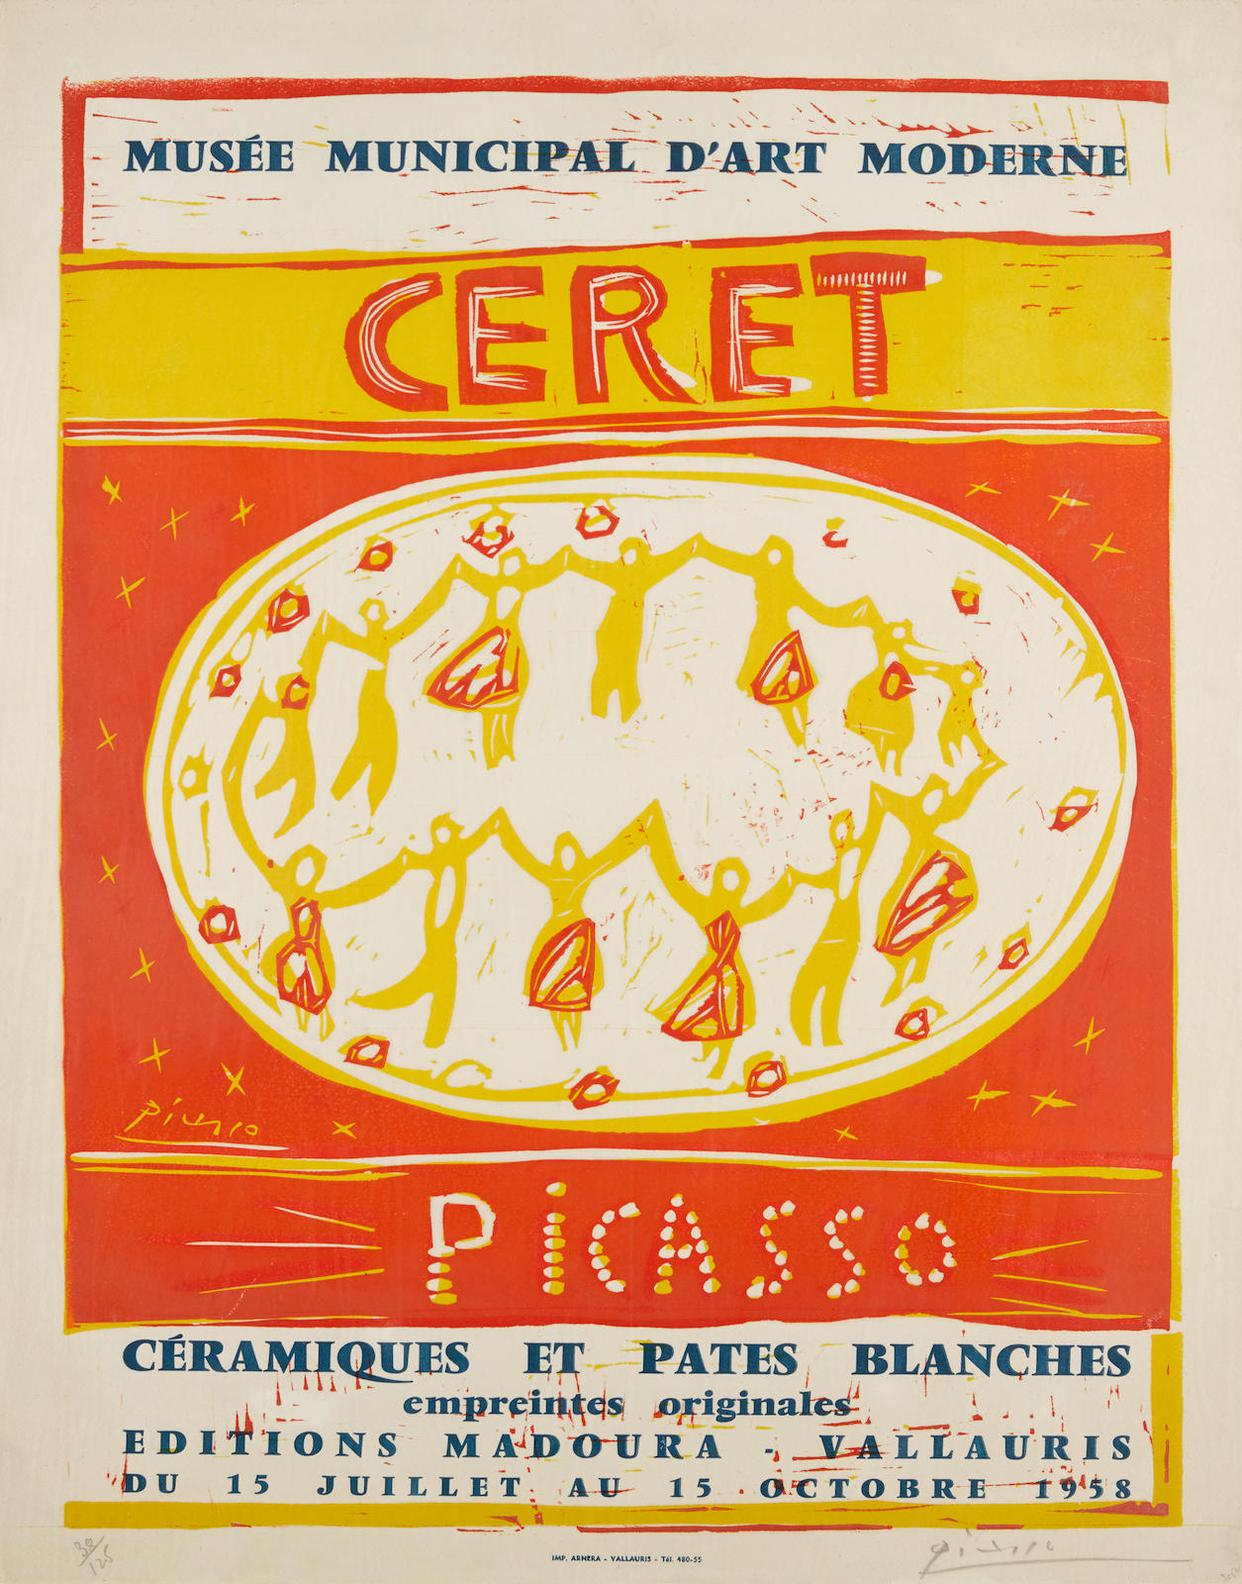 Pablo Picasso-Musee Municipal Dart Moderne Ceret (B. 1283; Ba. 1048)-1956